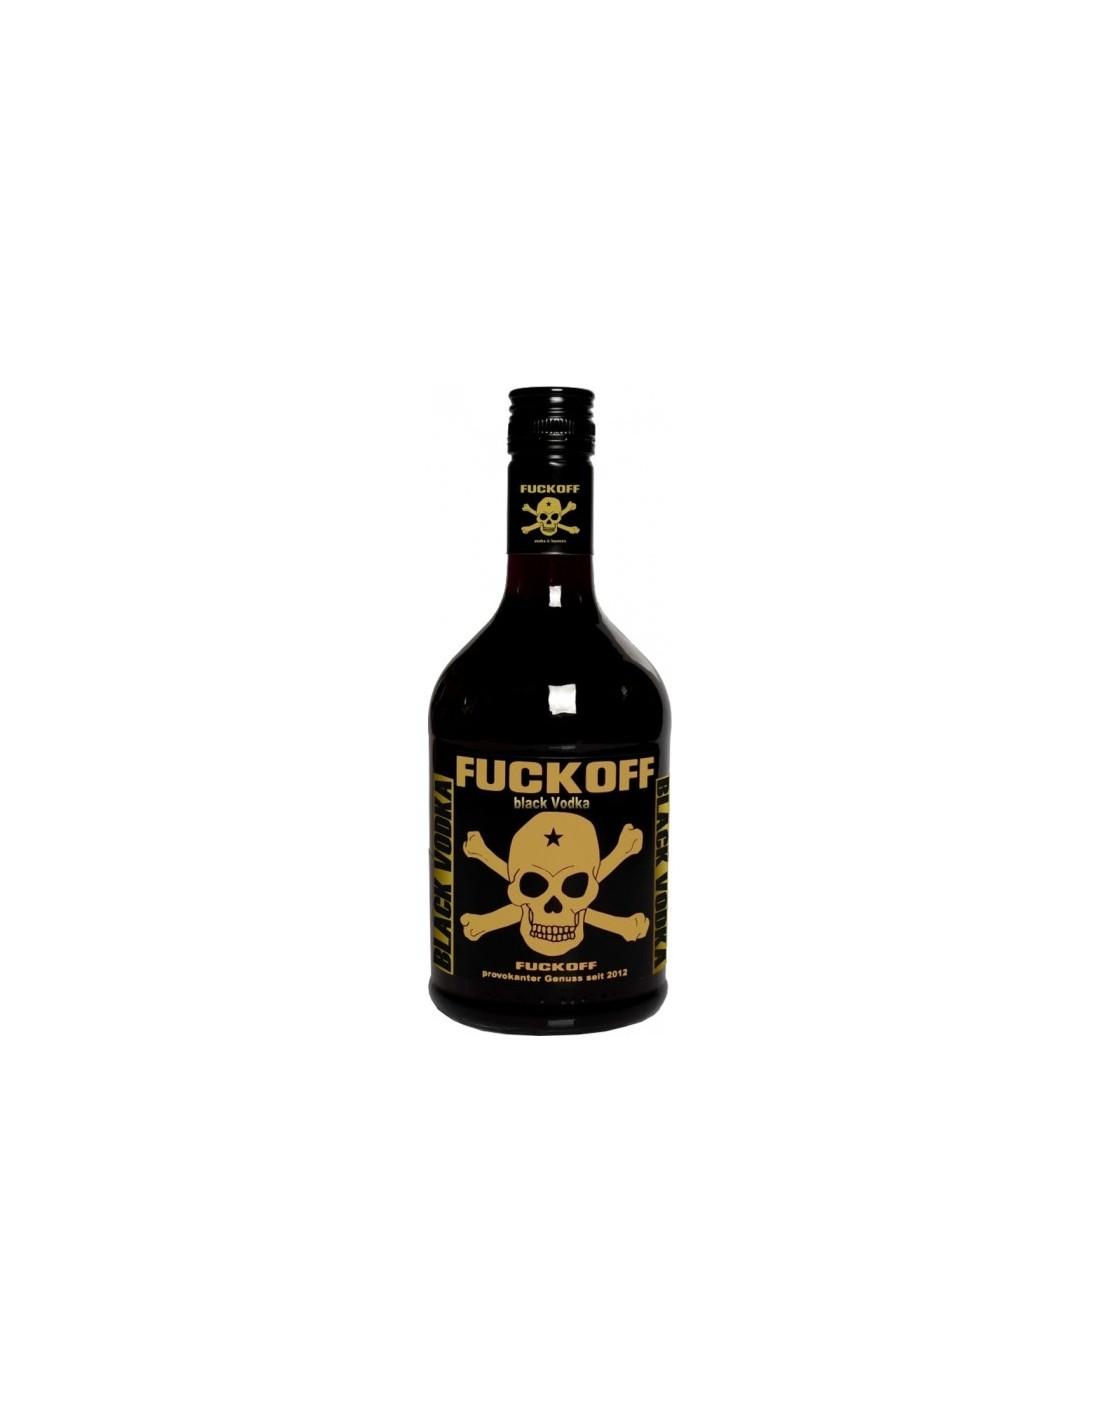 Vodca Fuckoff Black 0.7L, 40% alc., Germania